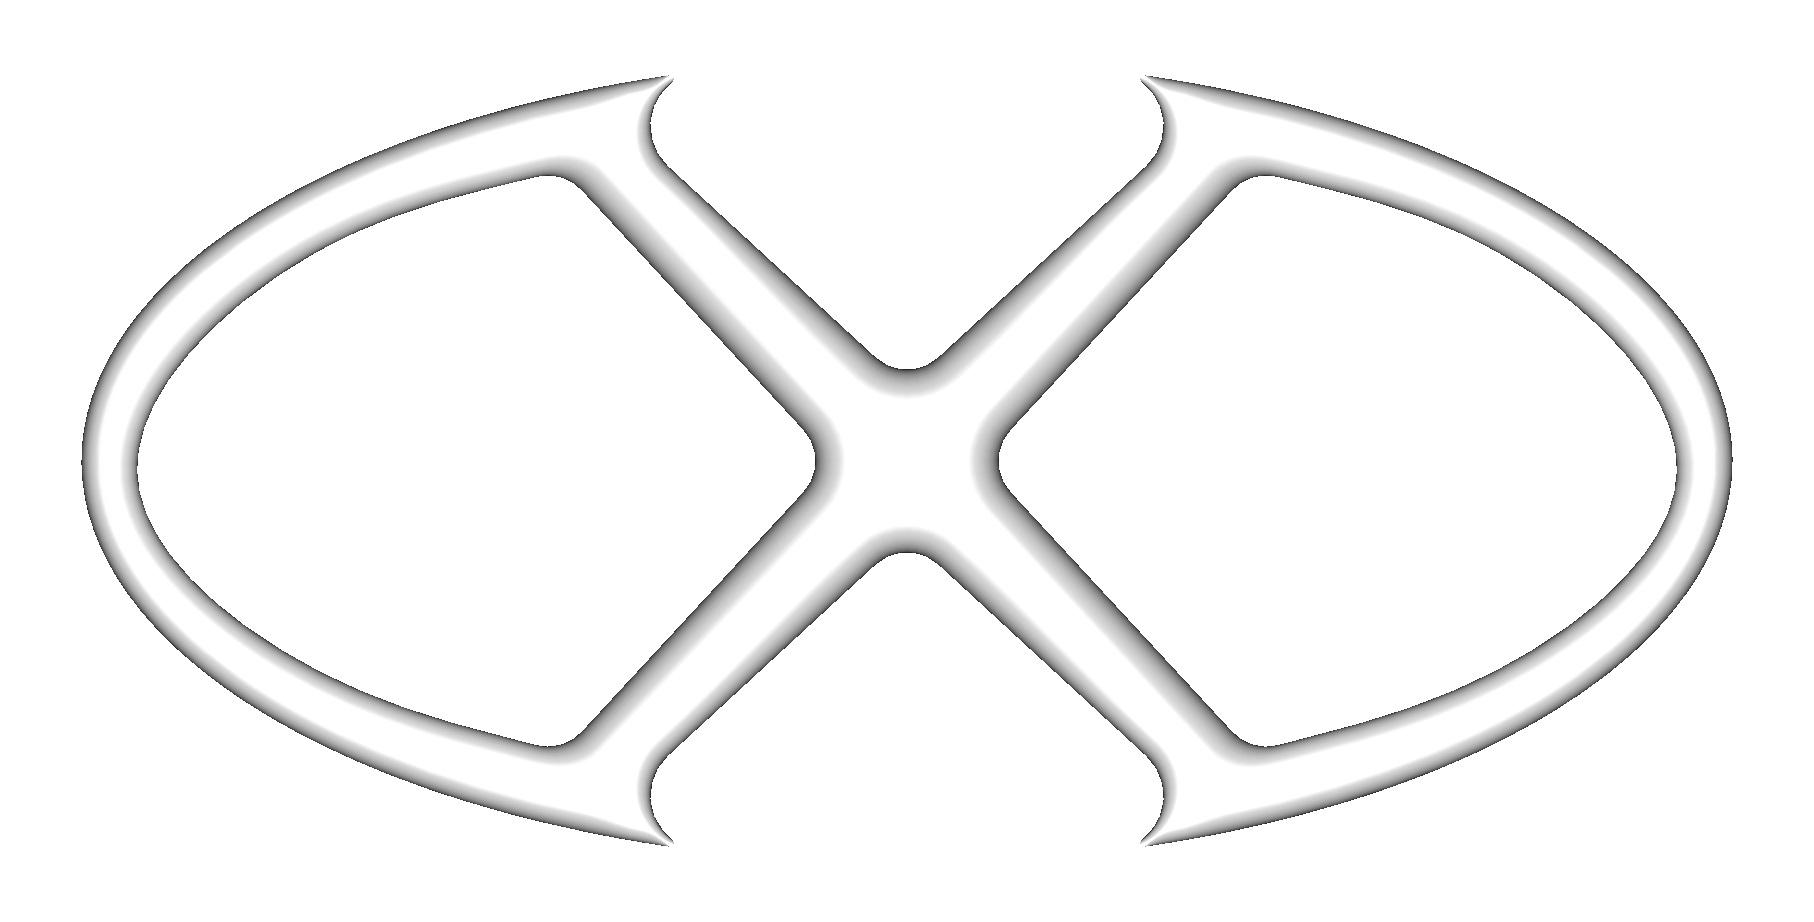 MX83 Rear Adjustable Arms - Pro Comp